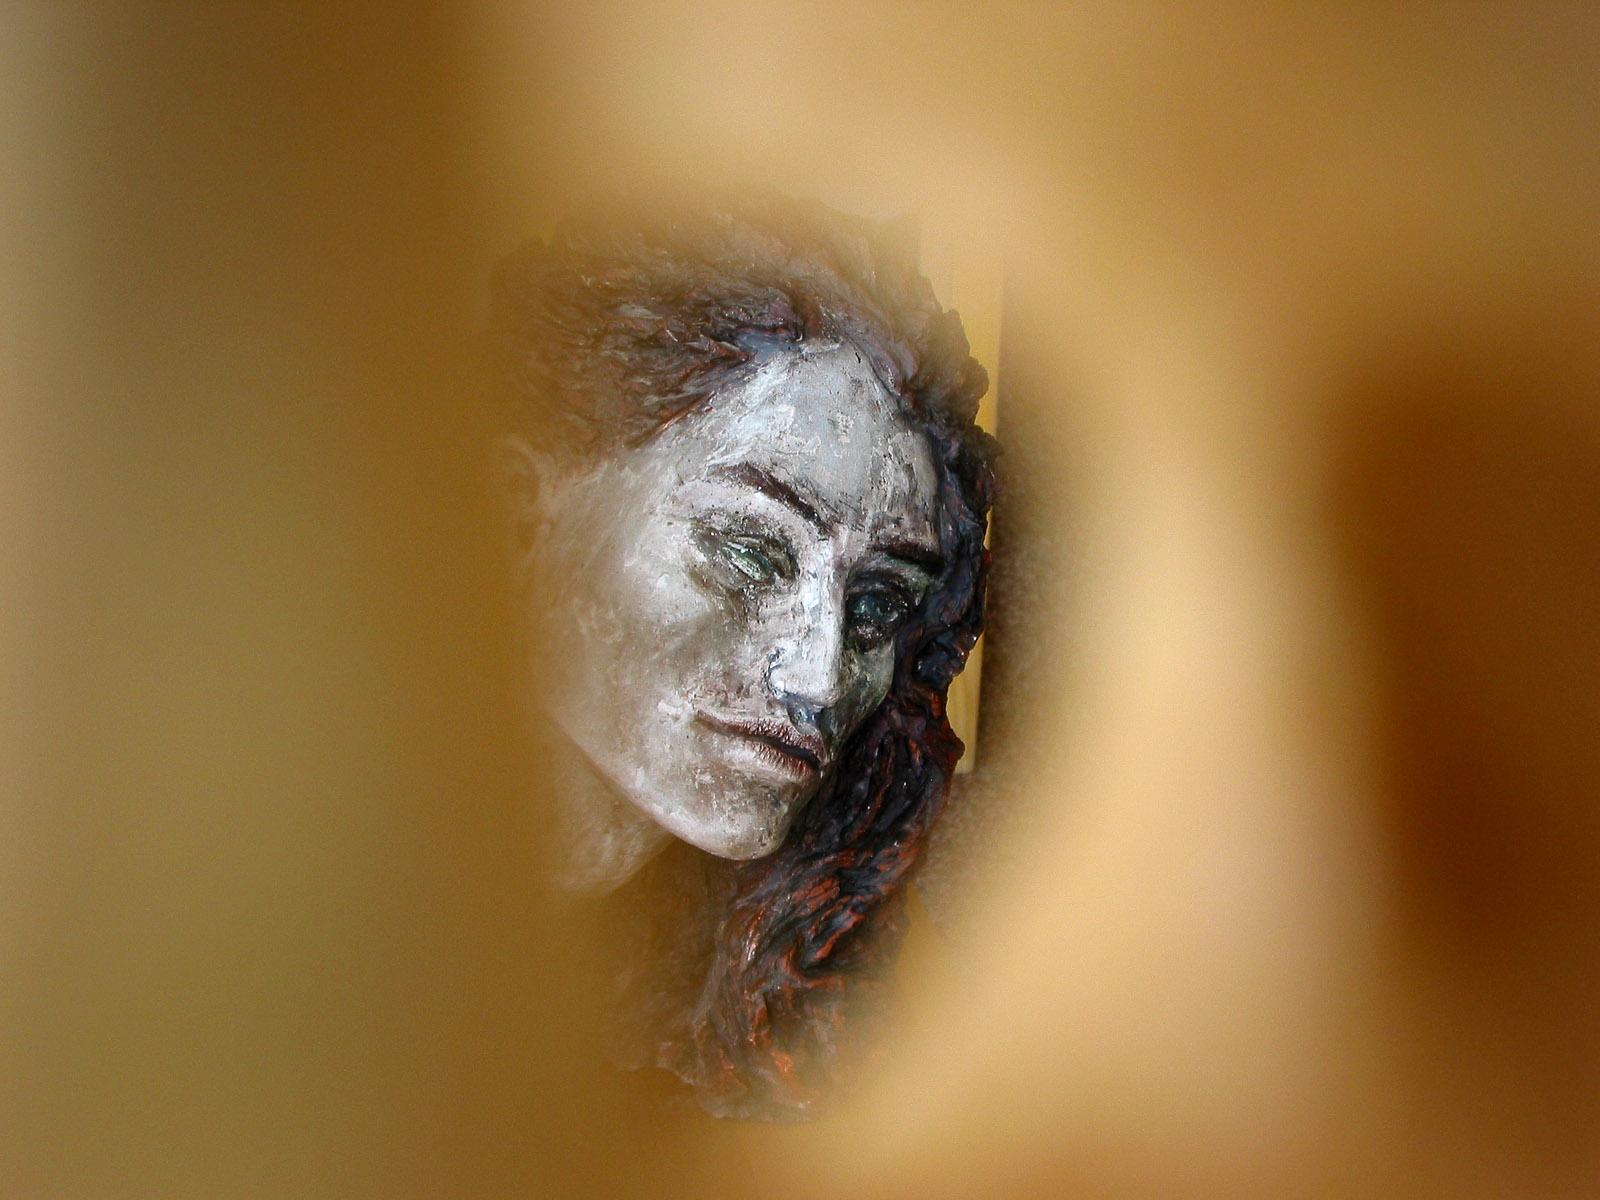 Erynia - rzeźba, ArsKinga - Kinga Pawełska